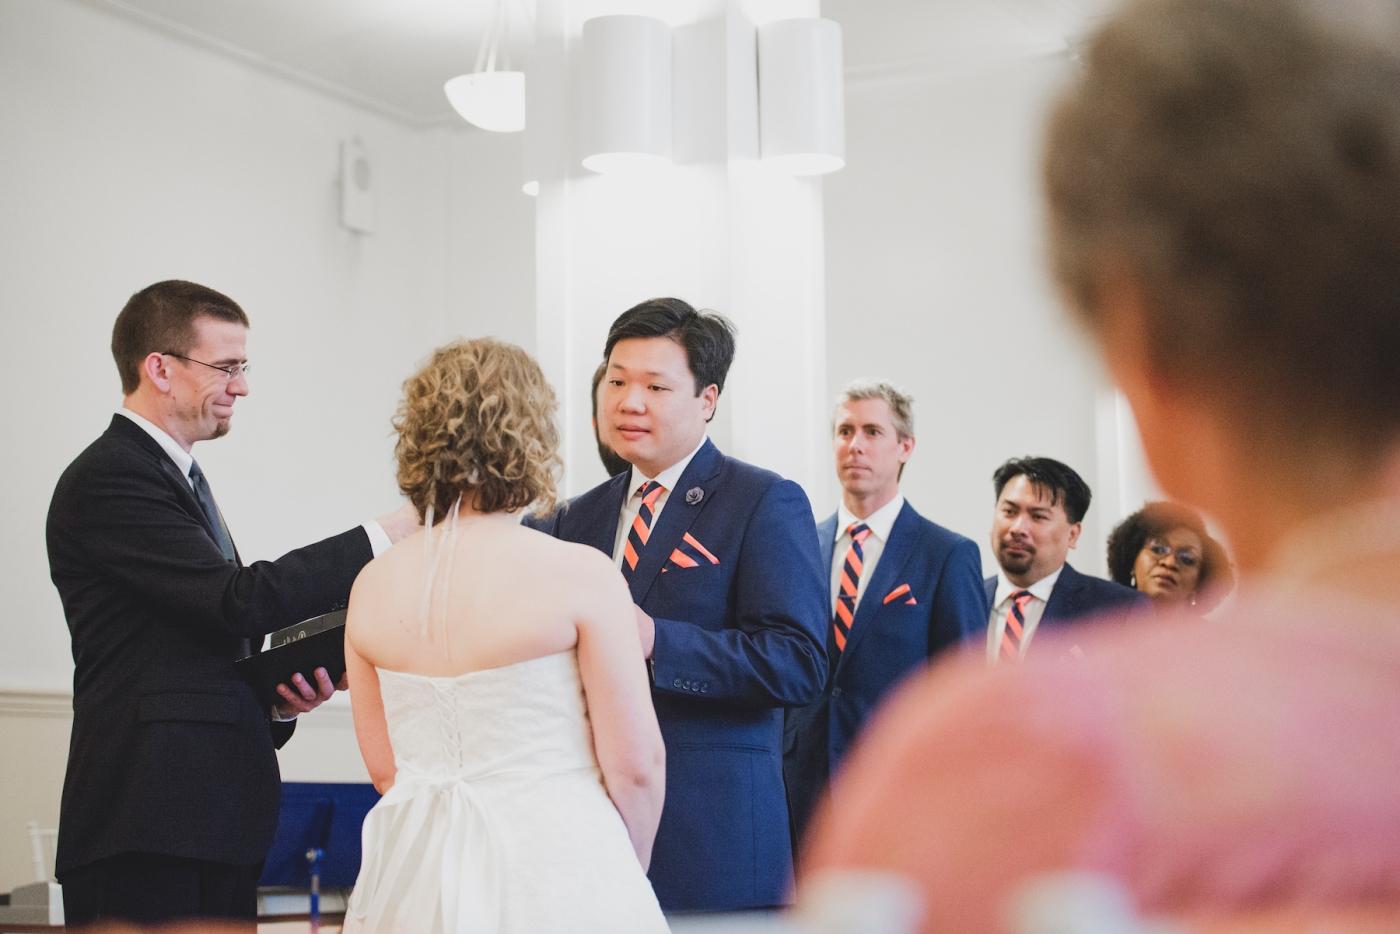 DSC_2670Everett_Wedding_Ballroom_Jane_Speleers_photography_Rachel_and_Edmund_Ceremony_2017